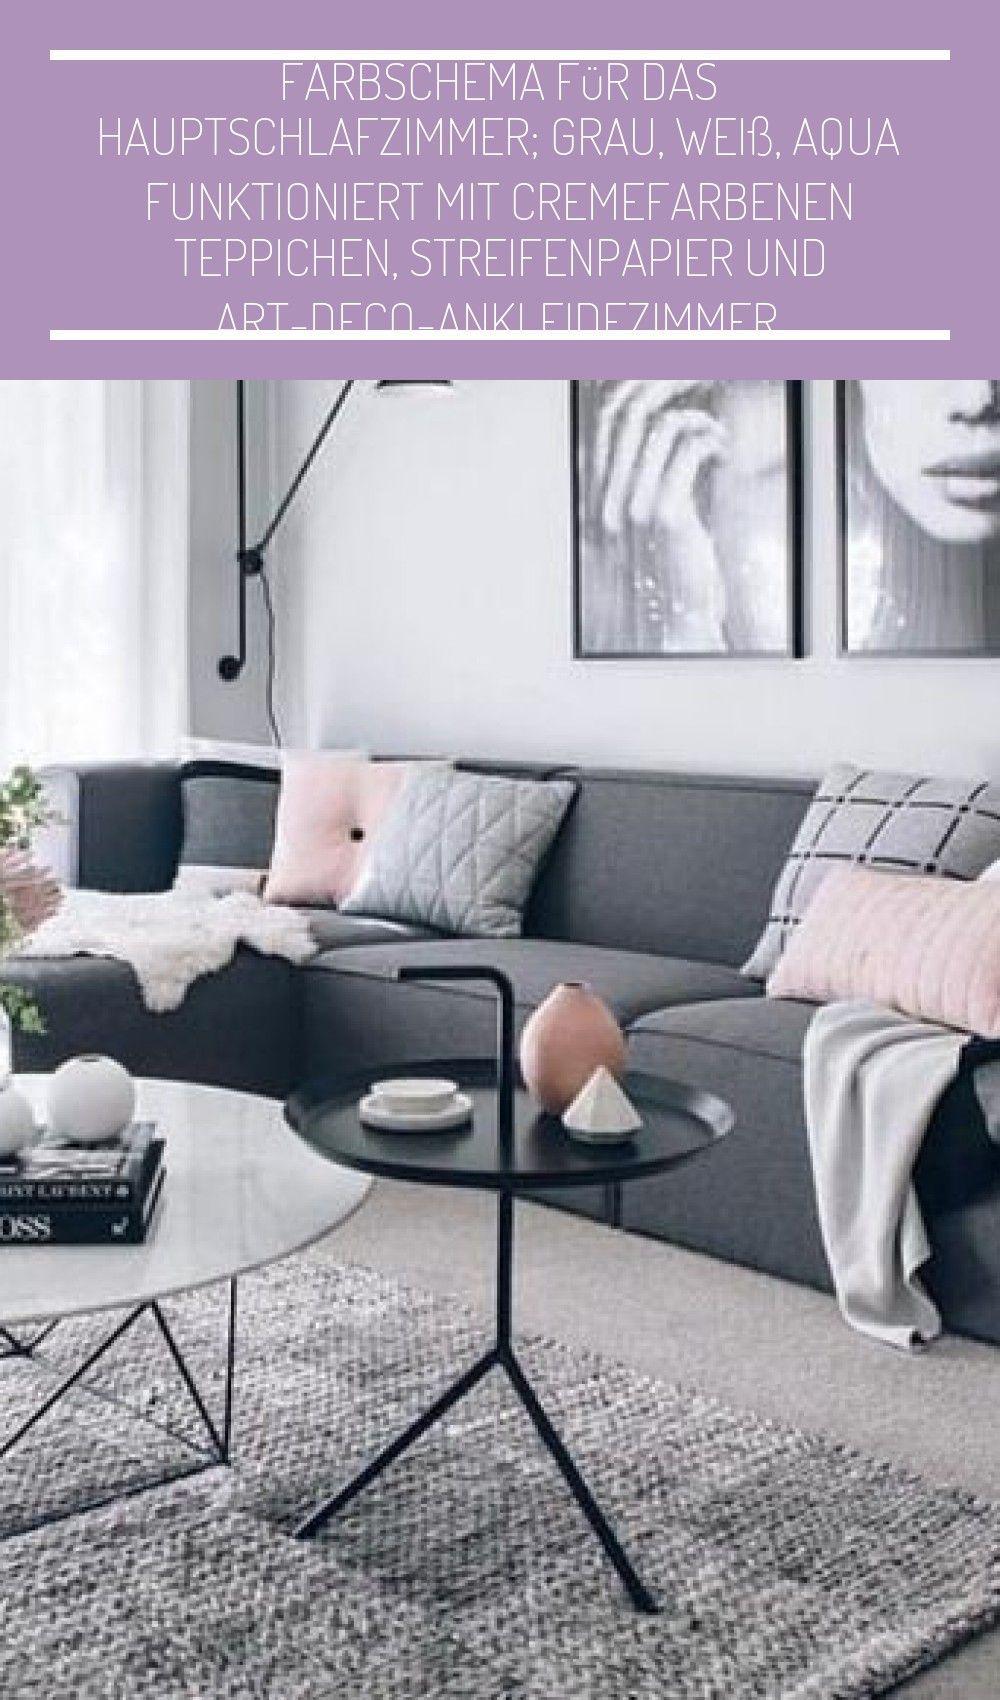 Dark Gray Couch Throw Pillows Dunkelgraue S Dark Gray Couch Throw Pillows Dunkelgraue So In 2020 Couch Throw Pillows Grey Couch Living Room Grey Carpet Living Room